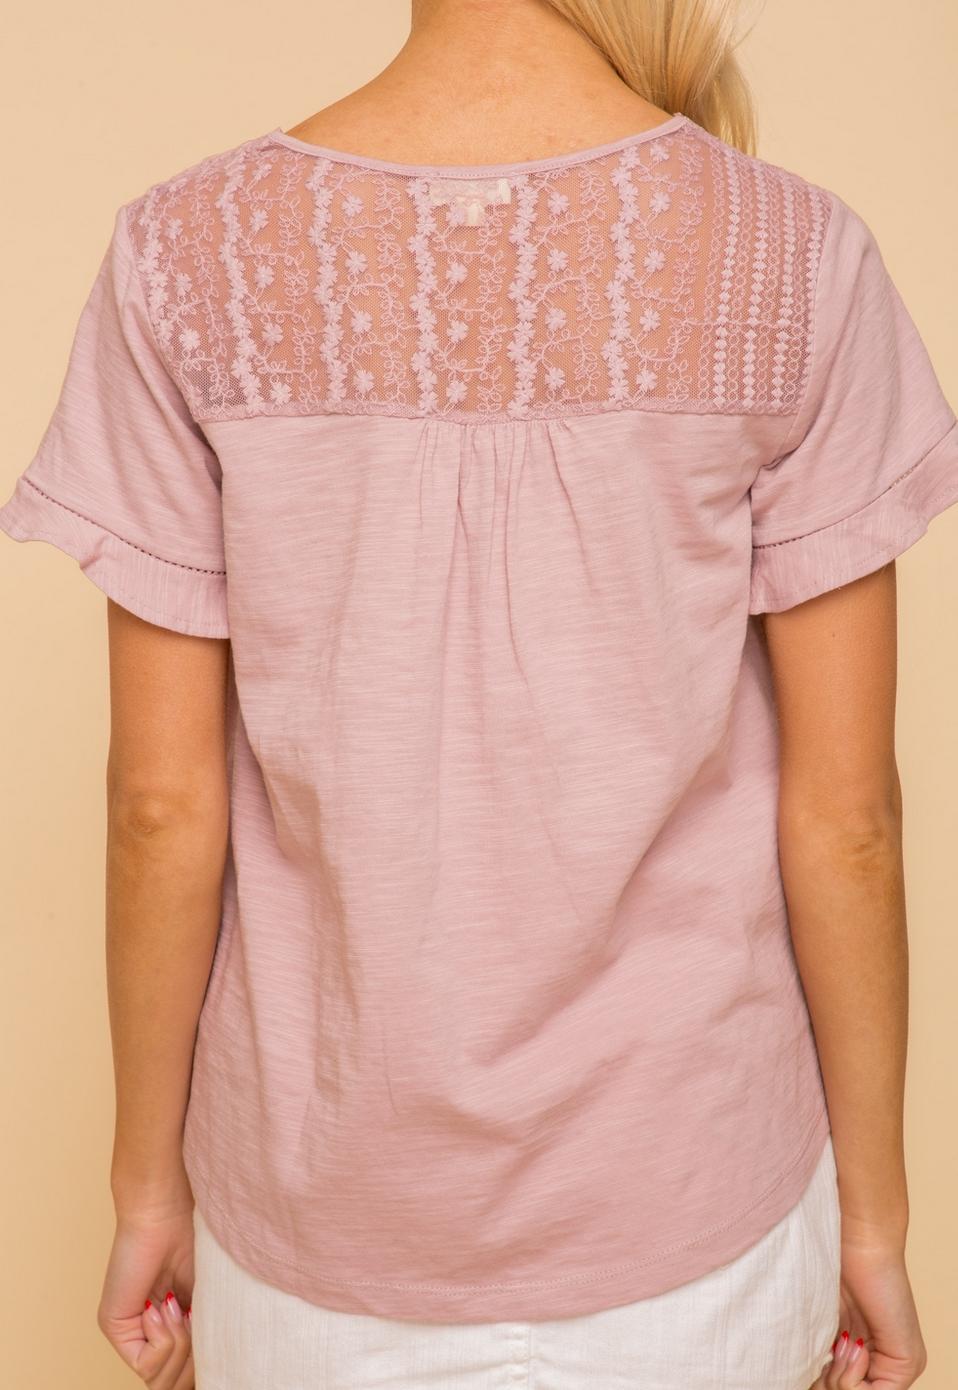 Hem & Thread Felicia Lace Top-Lavender